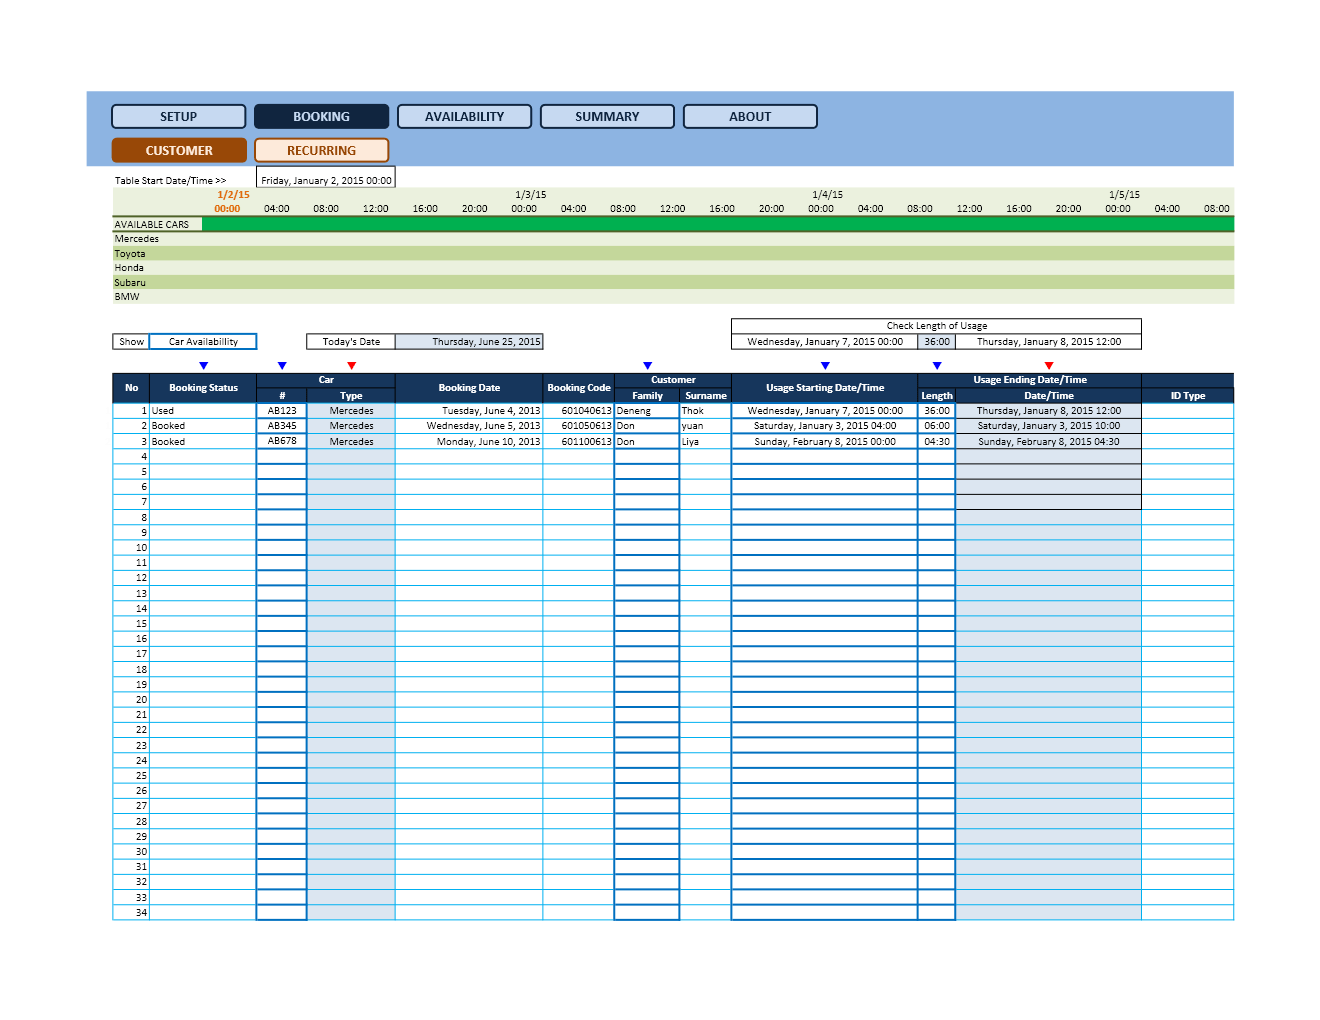 Hotel Inventory Spreadsheet